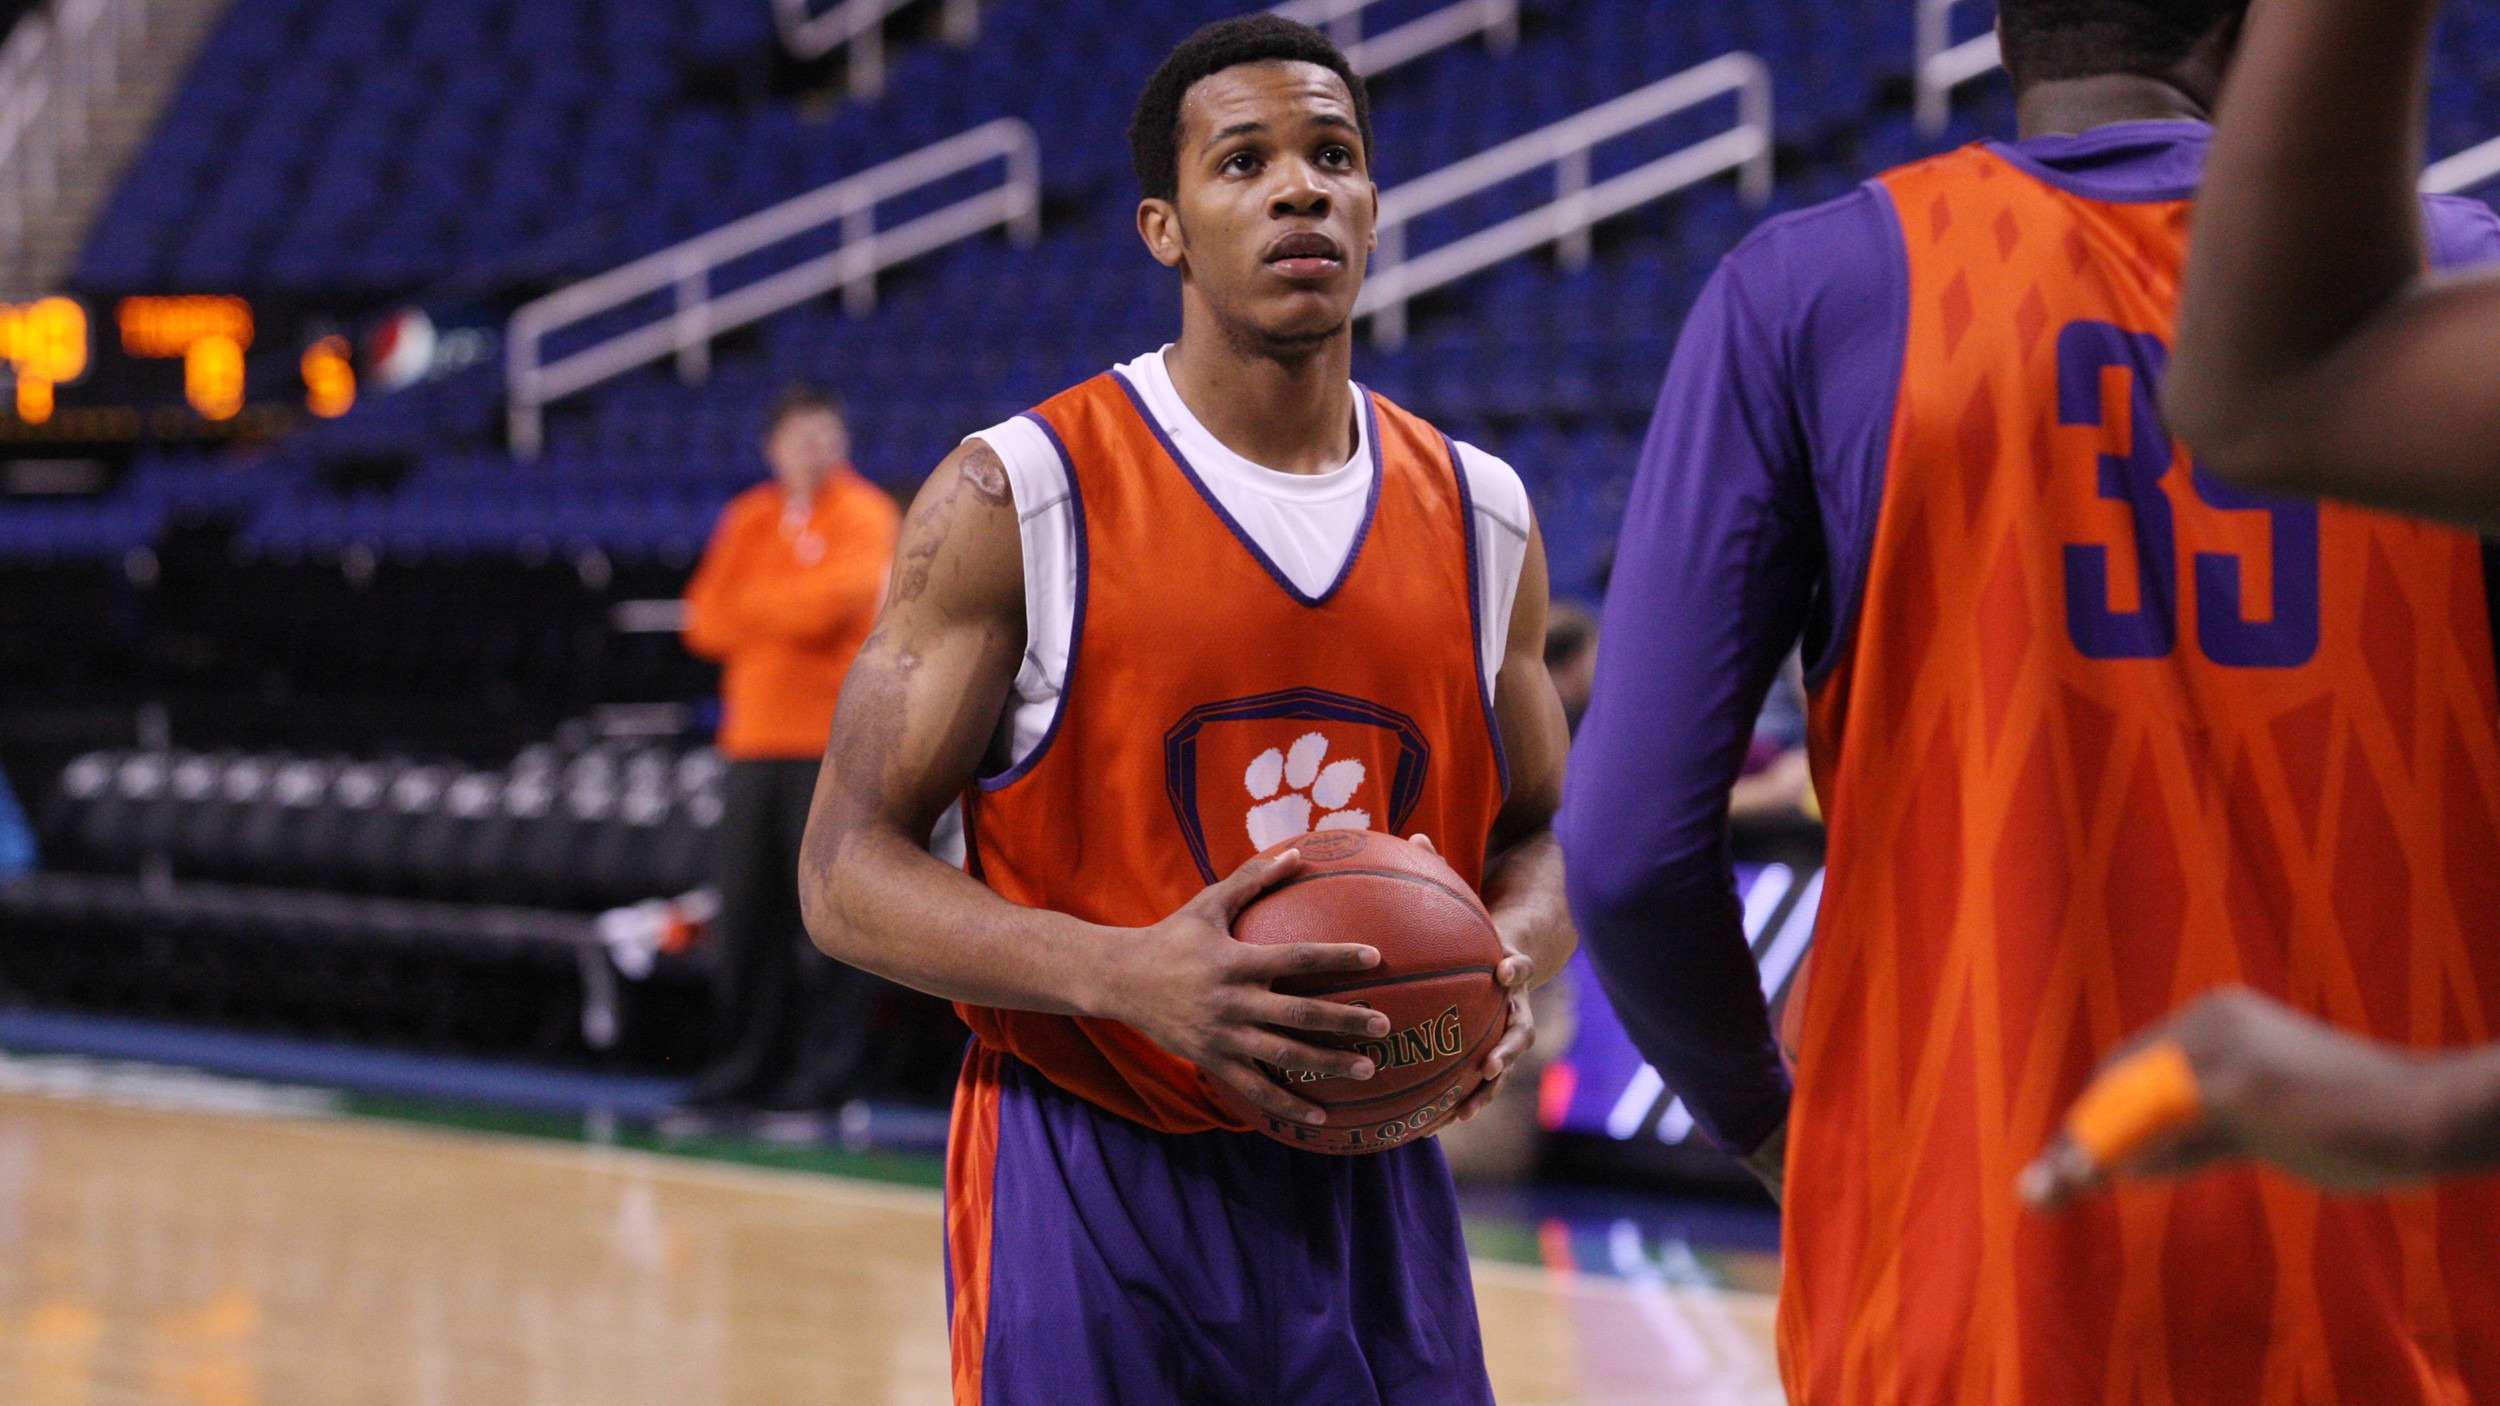 Clemson Men's Basketball Video Report: Blossomgame & Coleman Talk Rehab